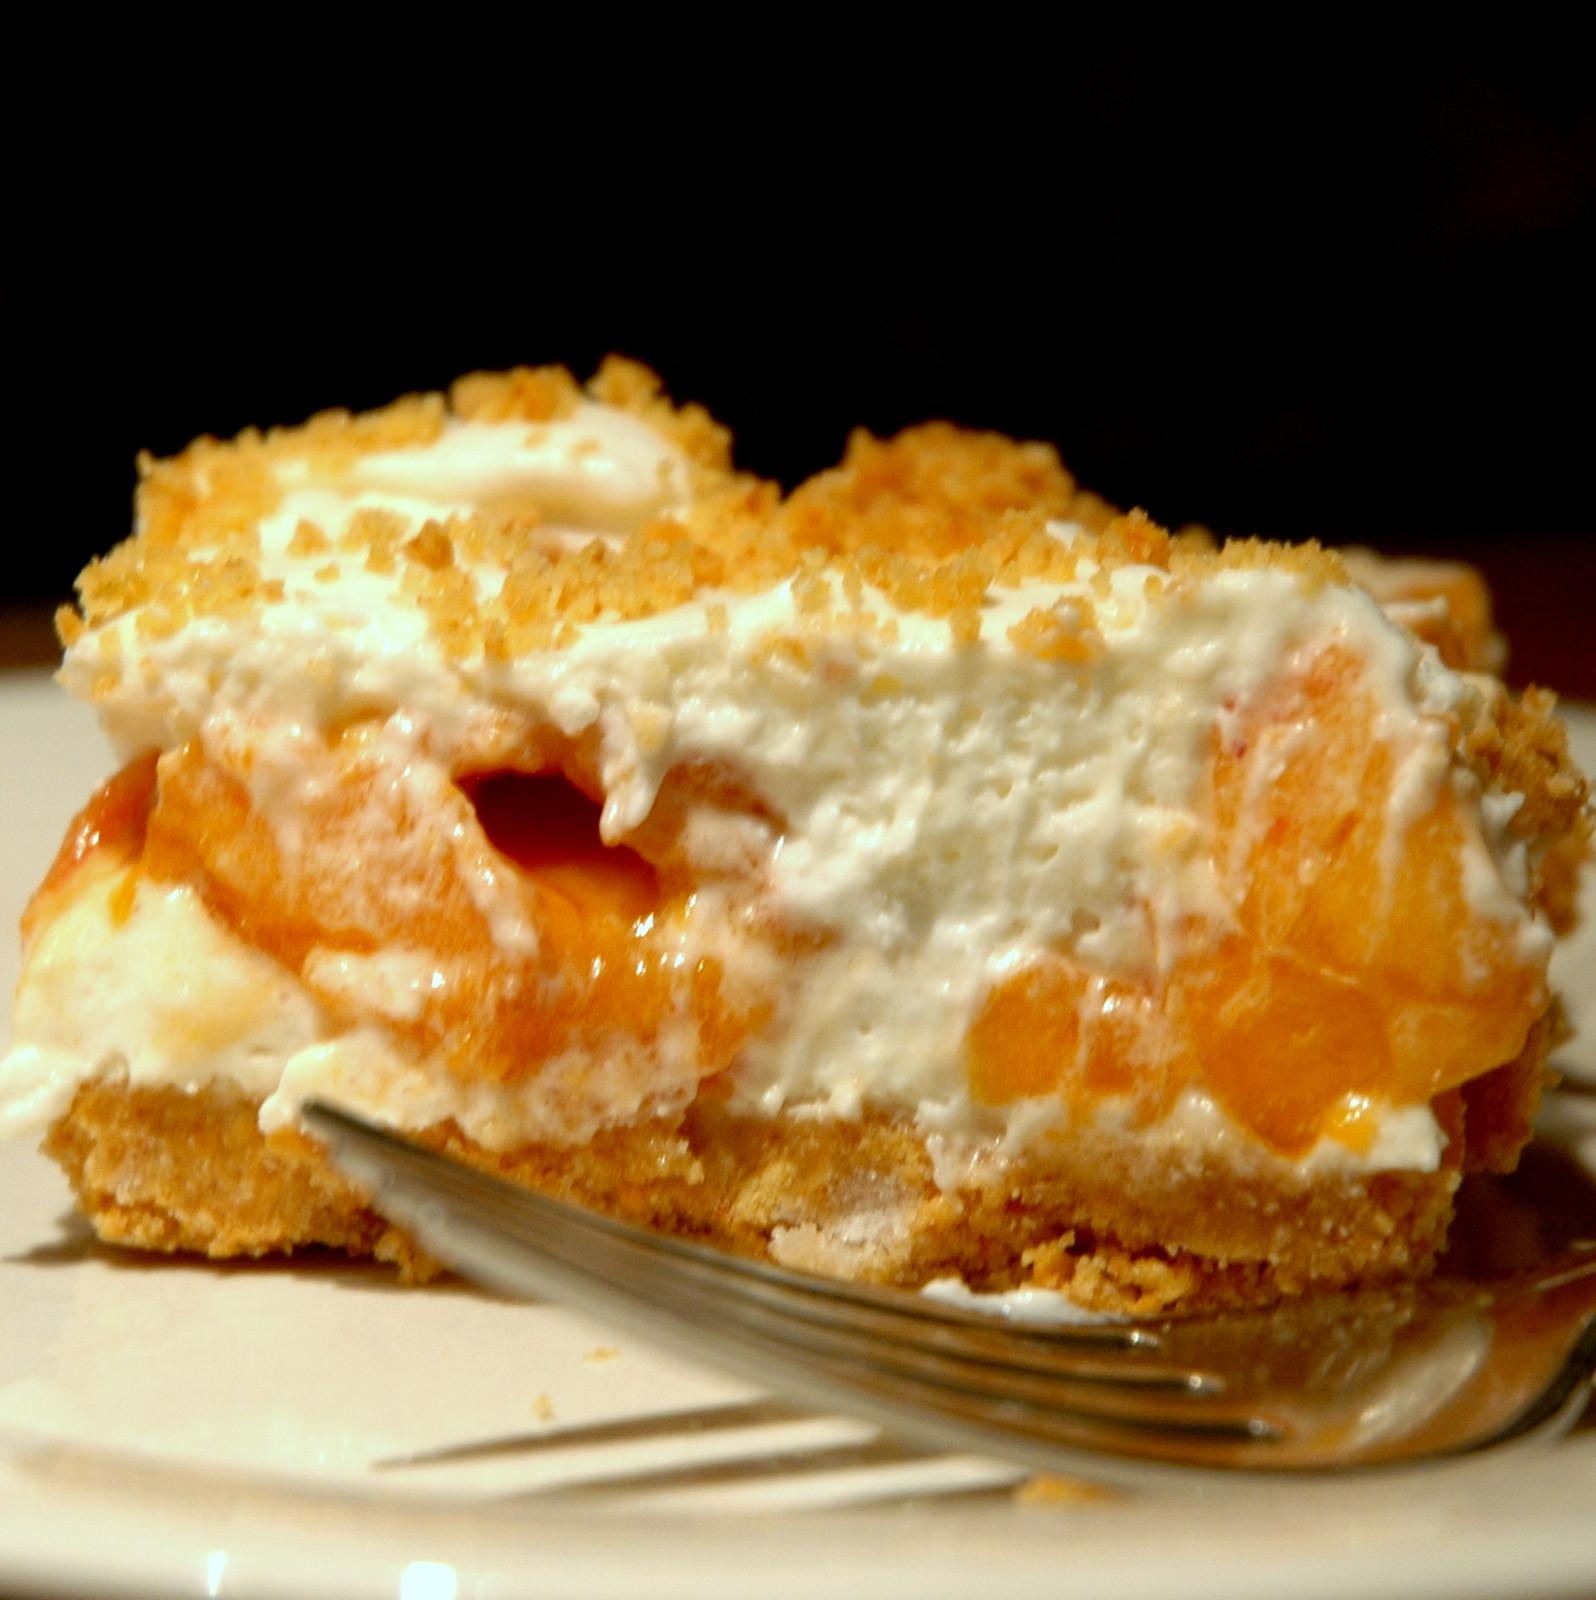 Fresh Peach Dessert  Cindy s Recipe Box Fresh Peach Dessert